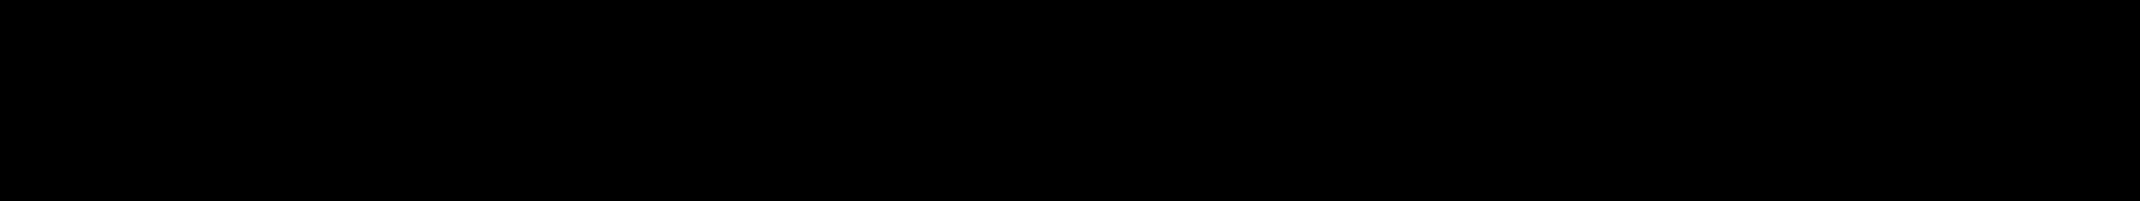 Rogue Sans Pro Medium Italic